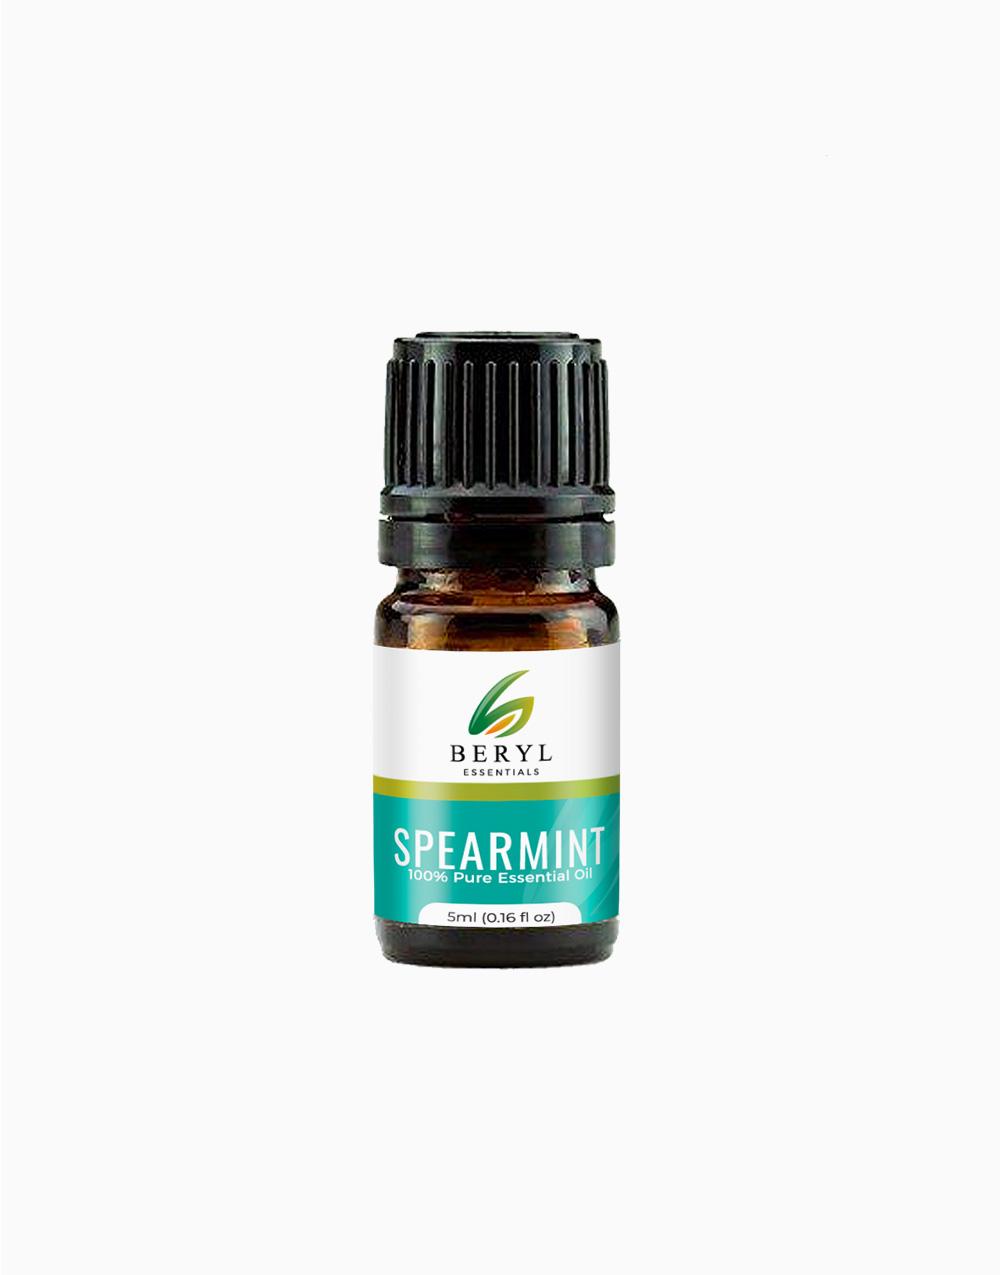 Spearmint Essential Oil by Beryl Essentials